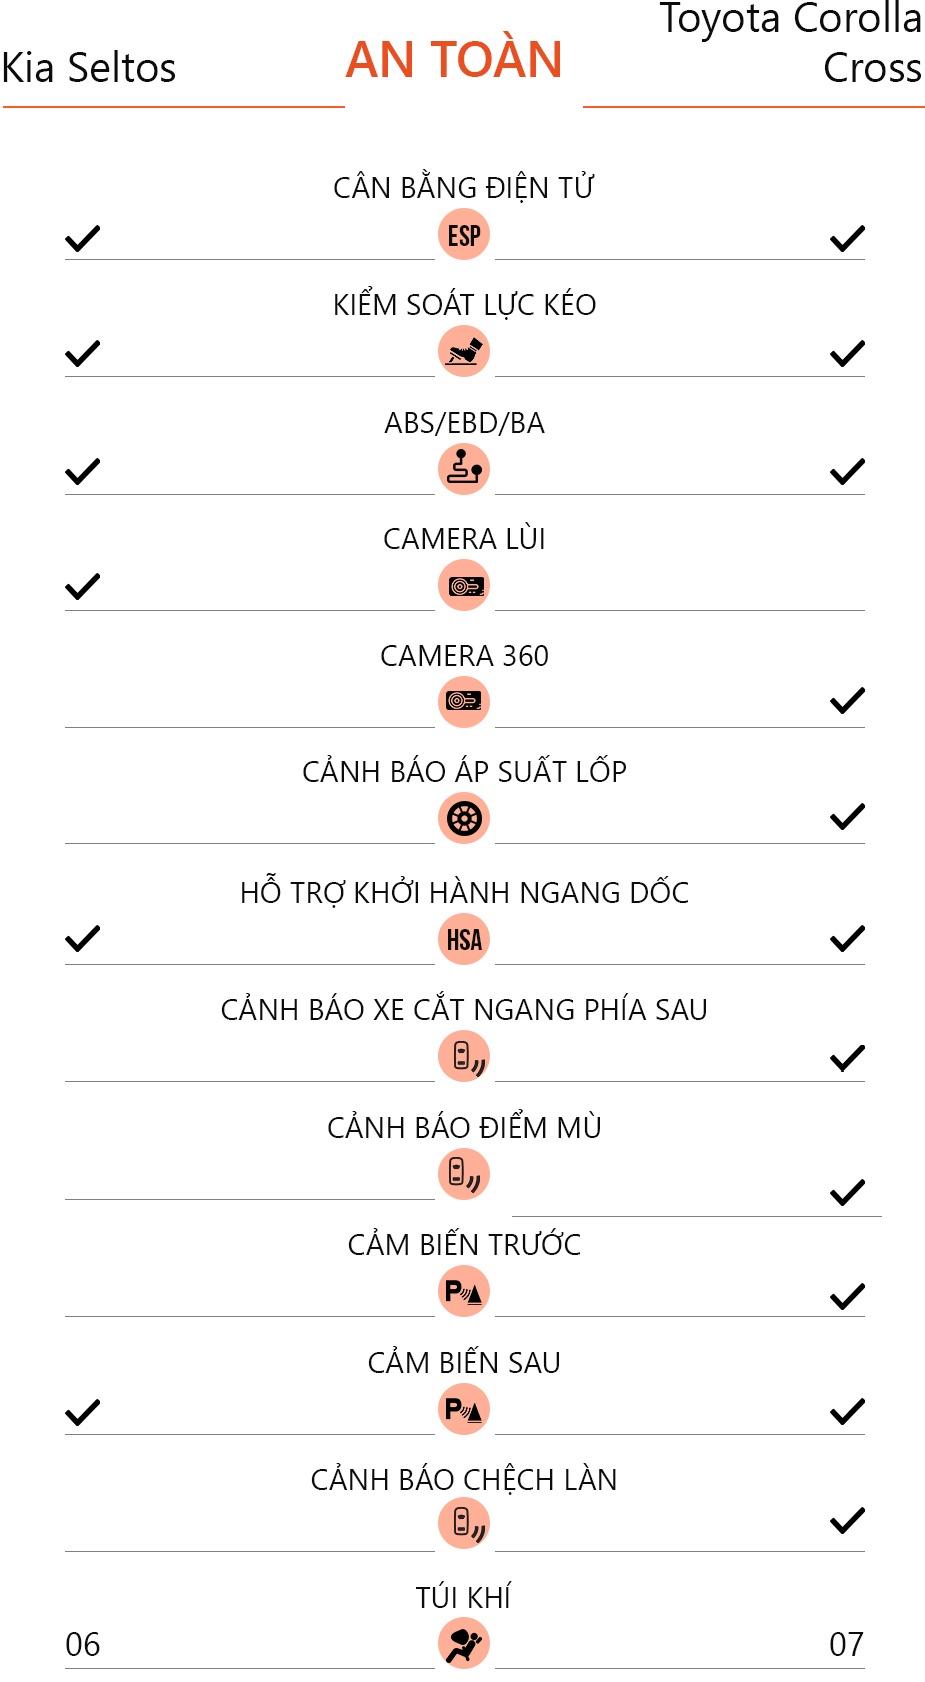 Chon Kia Seltos 1.4 Premium hay Toyota Corolla Cross 1.8V? anh 19